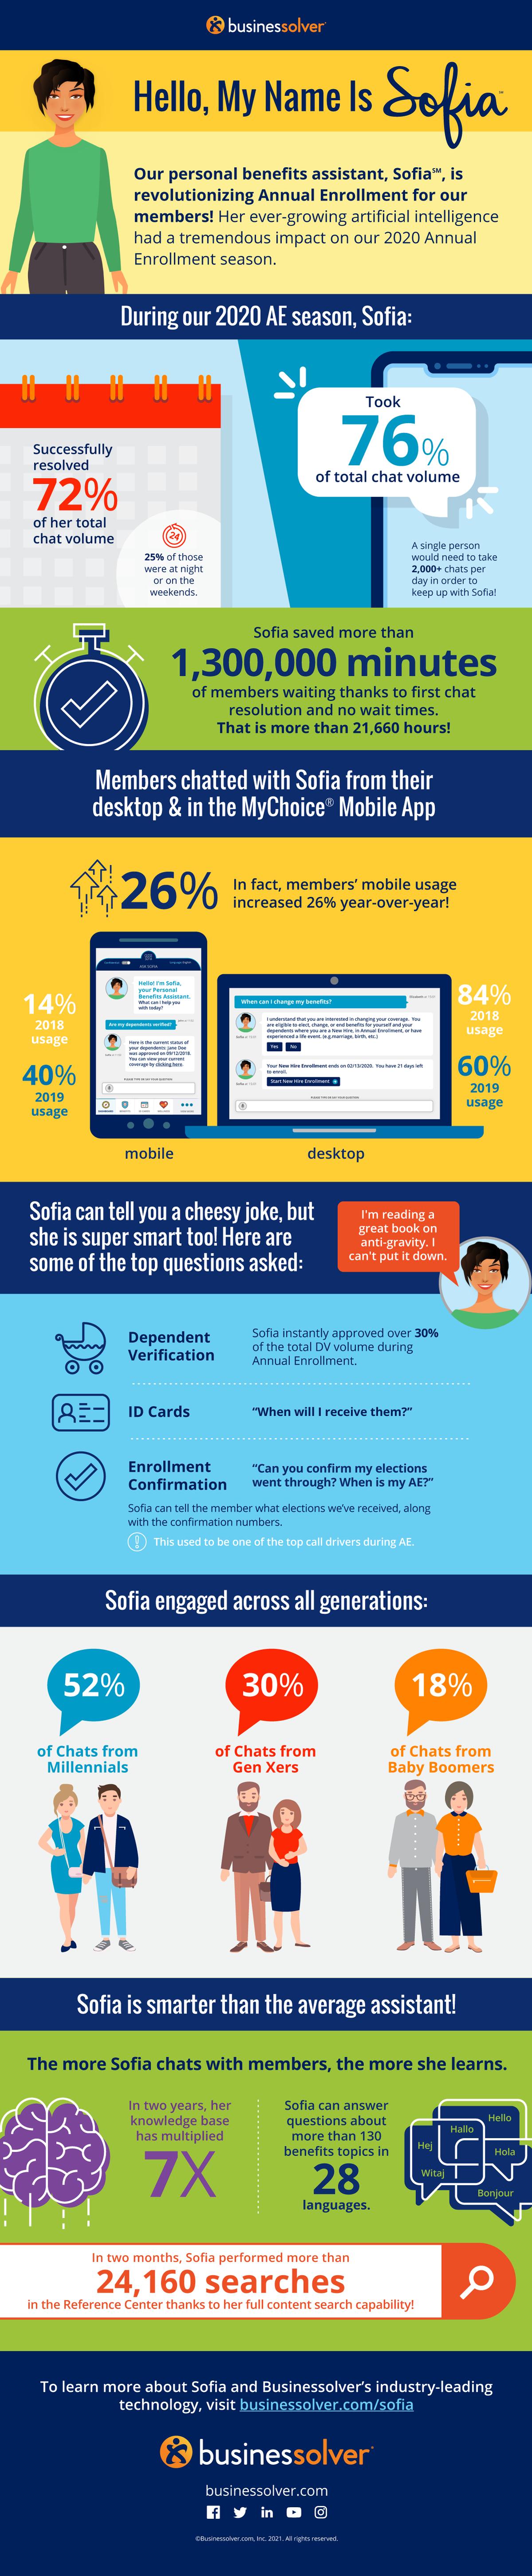 lp-img-sofia-infographic